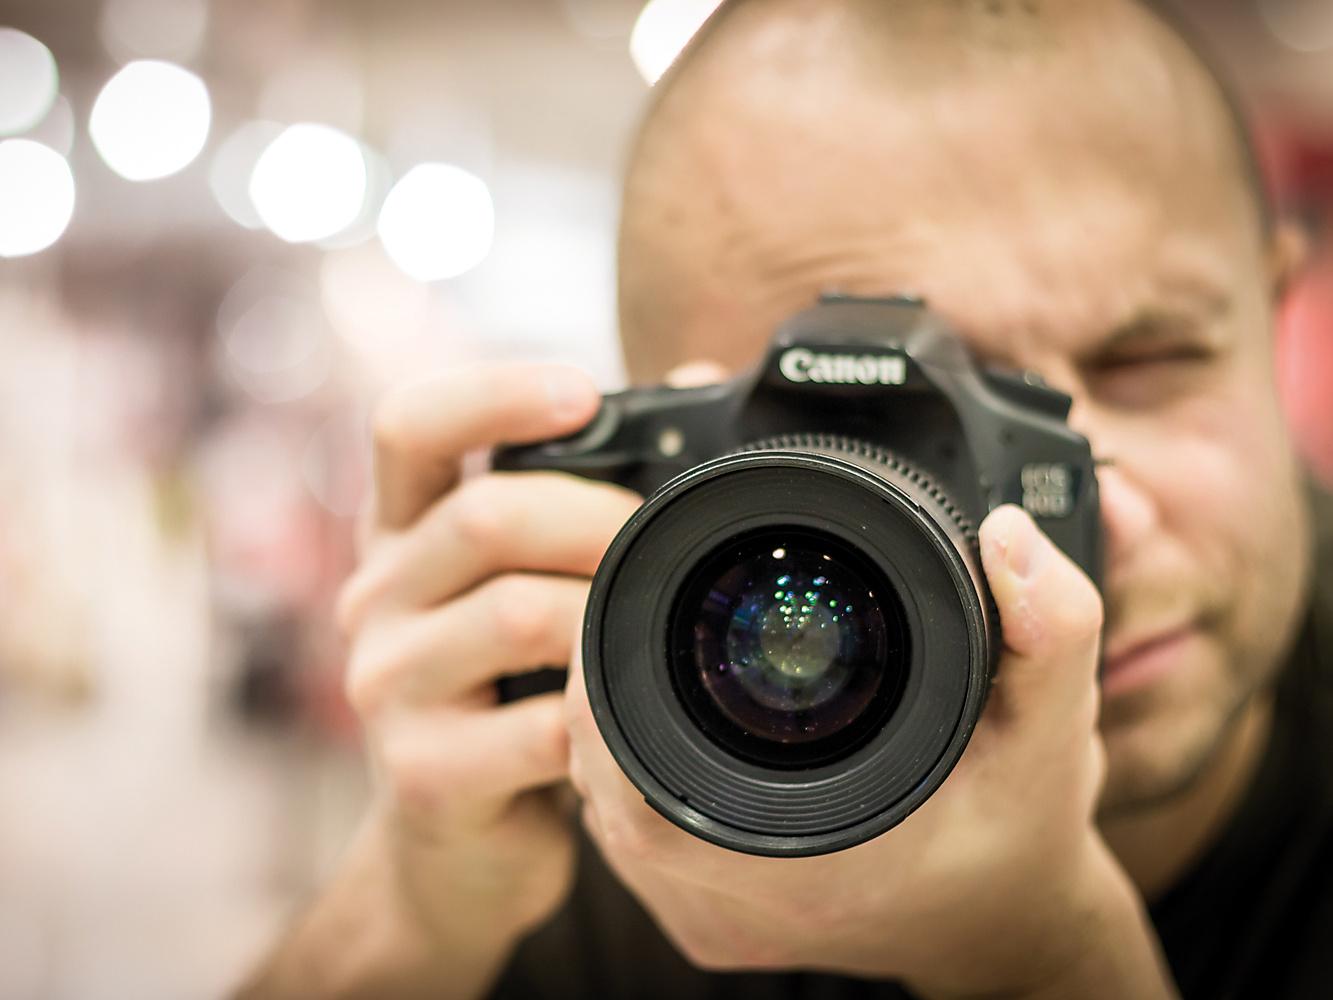 Fotografie cursus in Eindhoven volgen?